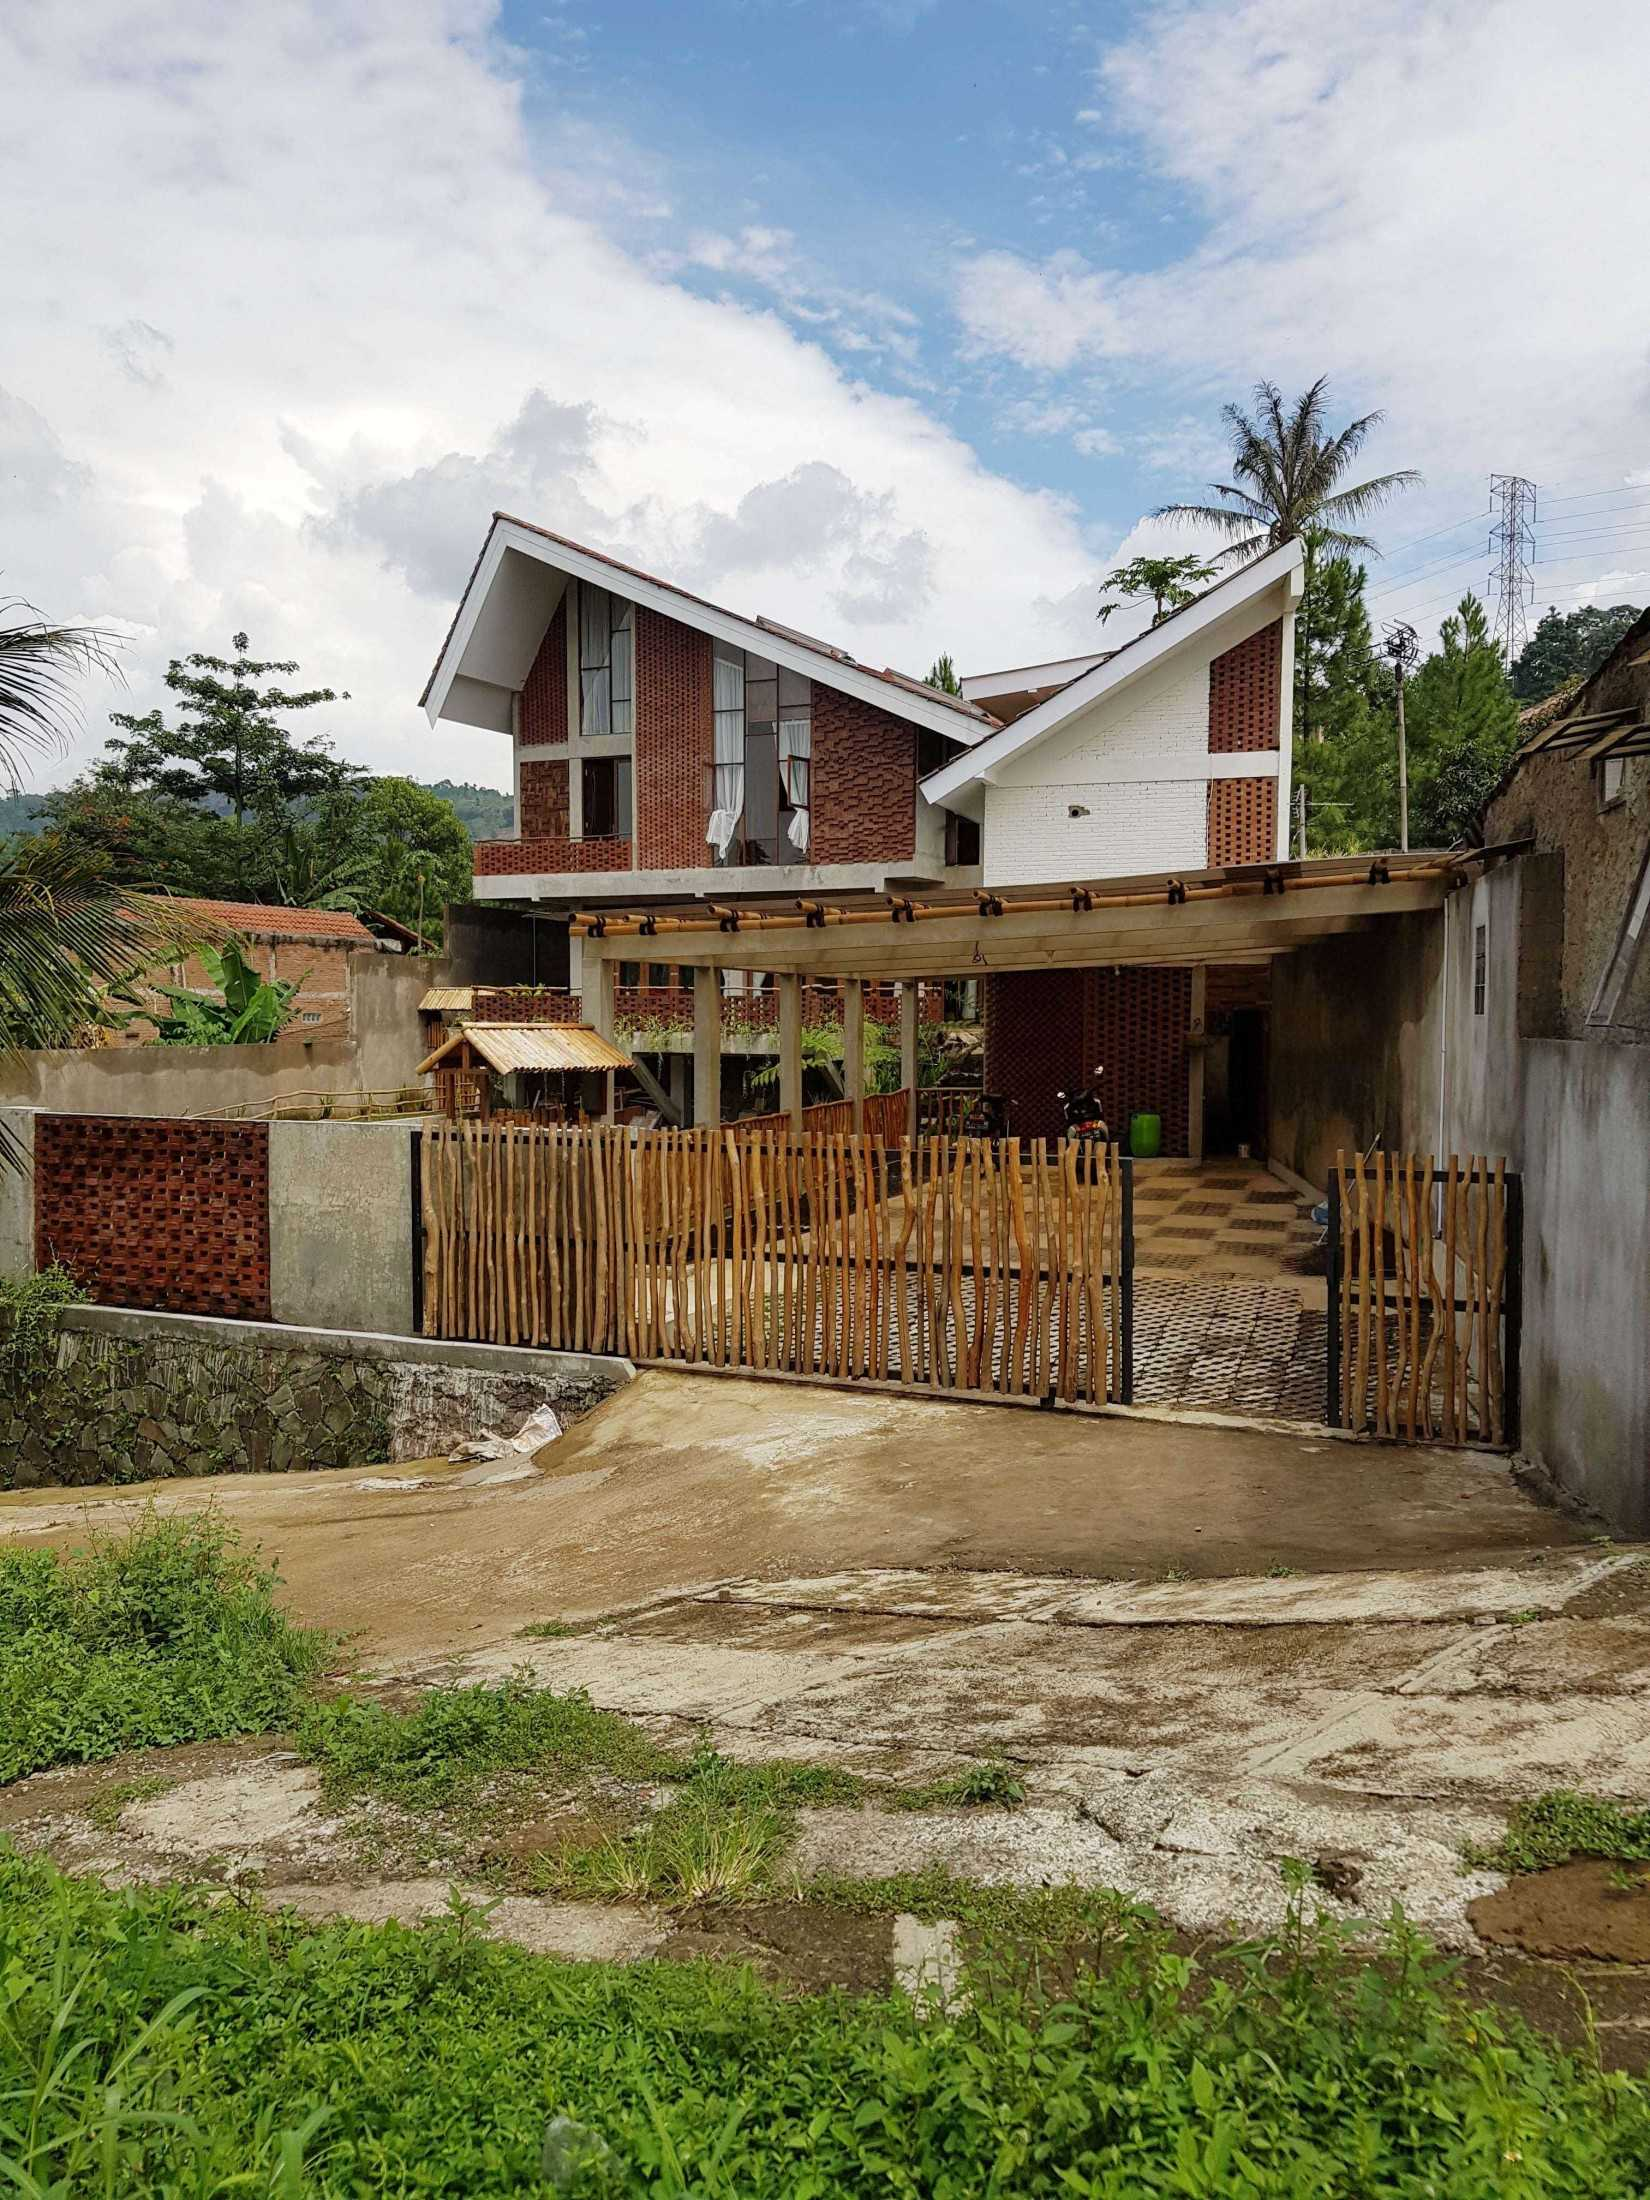 Junge Architekt Studio Imah Bata Villa, Bandung Indonesia Sindanglaya, Cimenyan, Bandung, Jawa Barat, Indonesia Sindanglaya, Cimenyan, Bandung, Jawa Barat, Indonesia Junge-Architekt-Studio-Imah-Bata-Villa-Bandung-Indonesia  67748